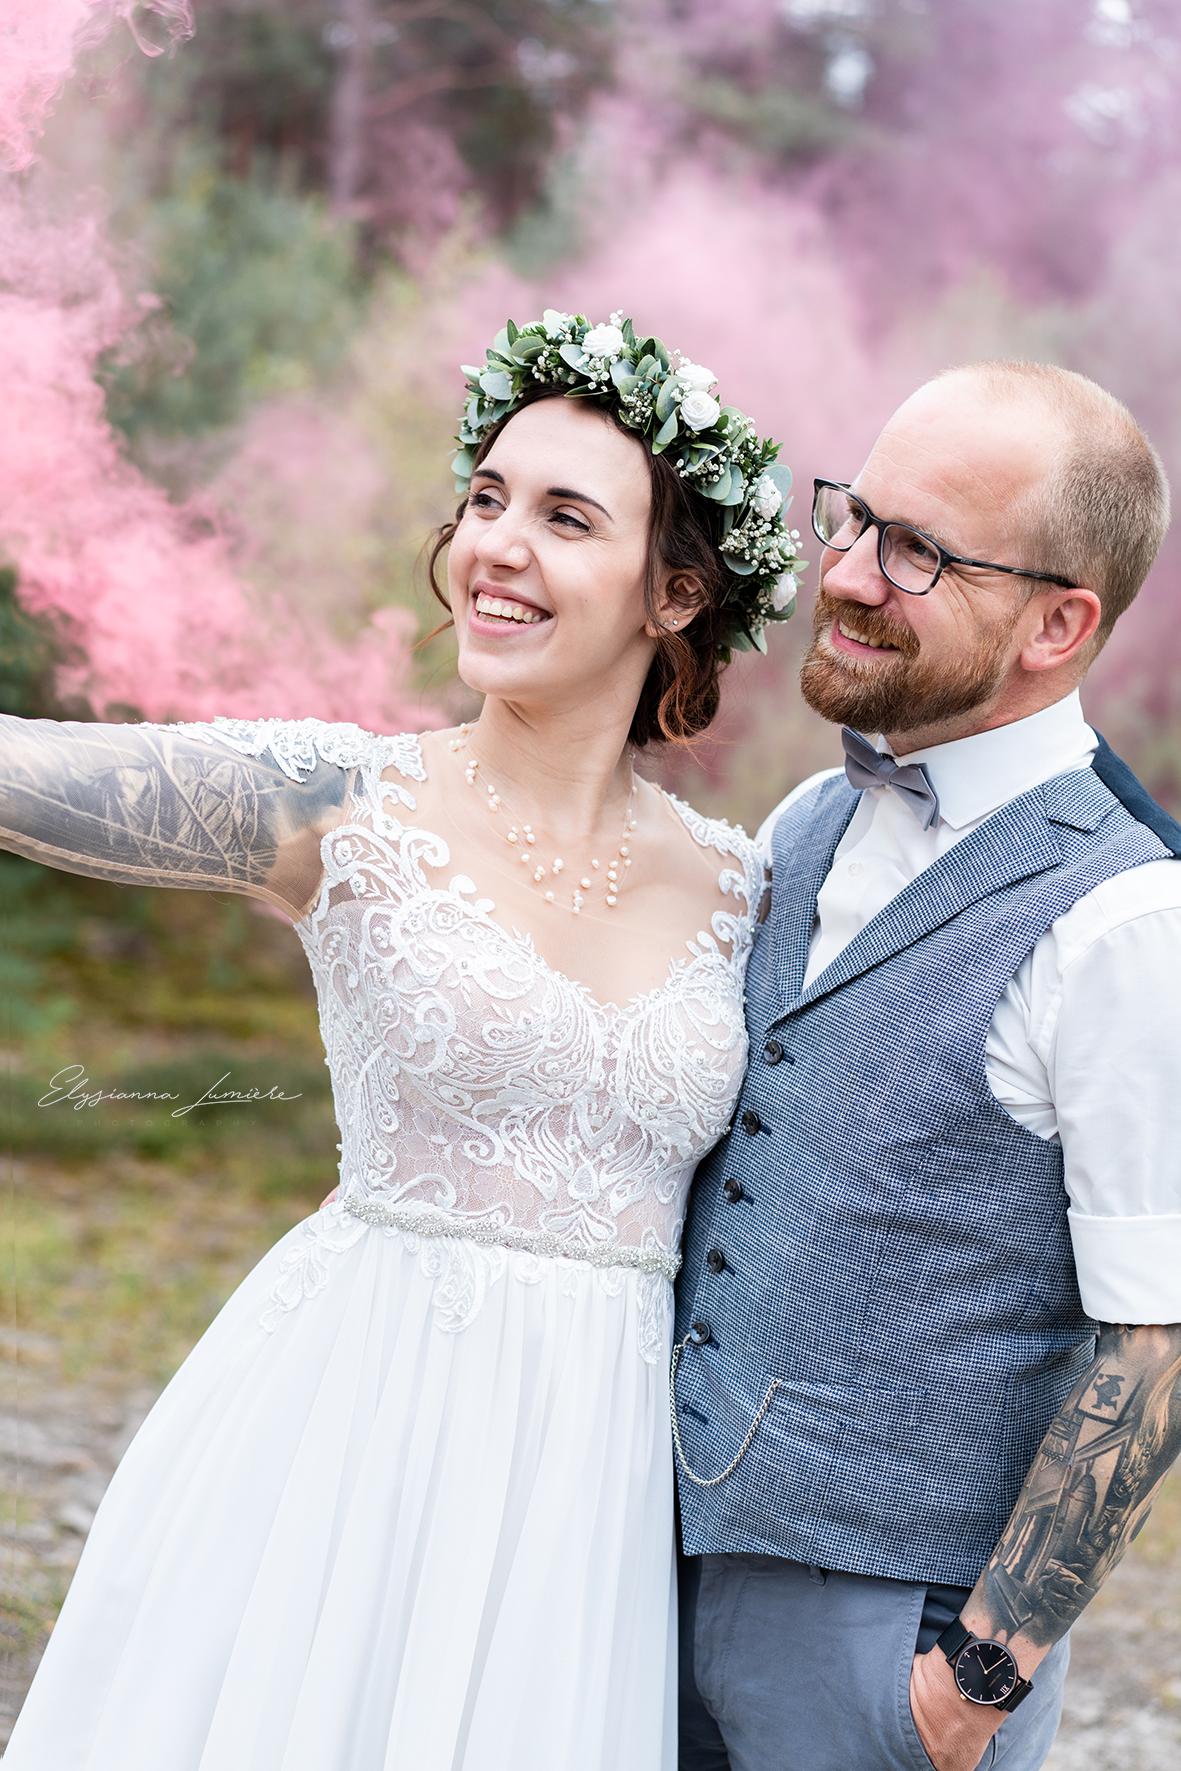 Brautpaarshooting Bohochic mit Rauchfackel